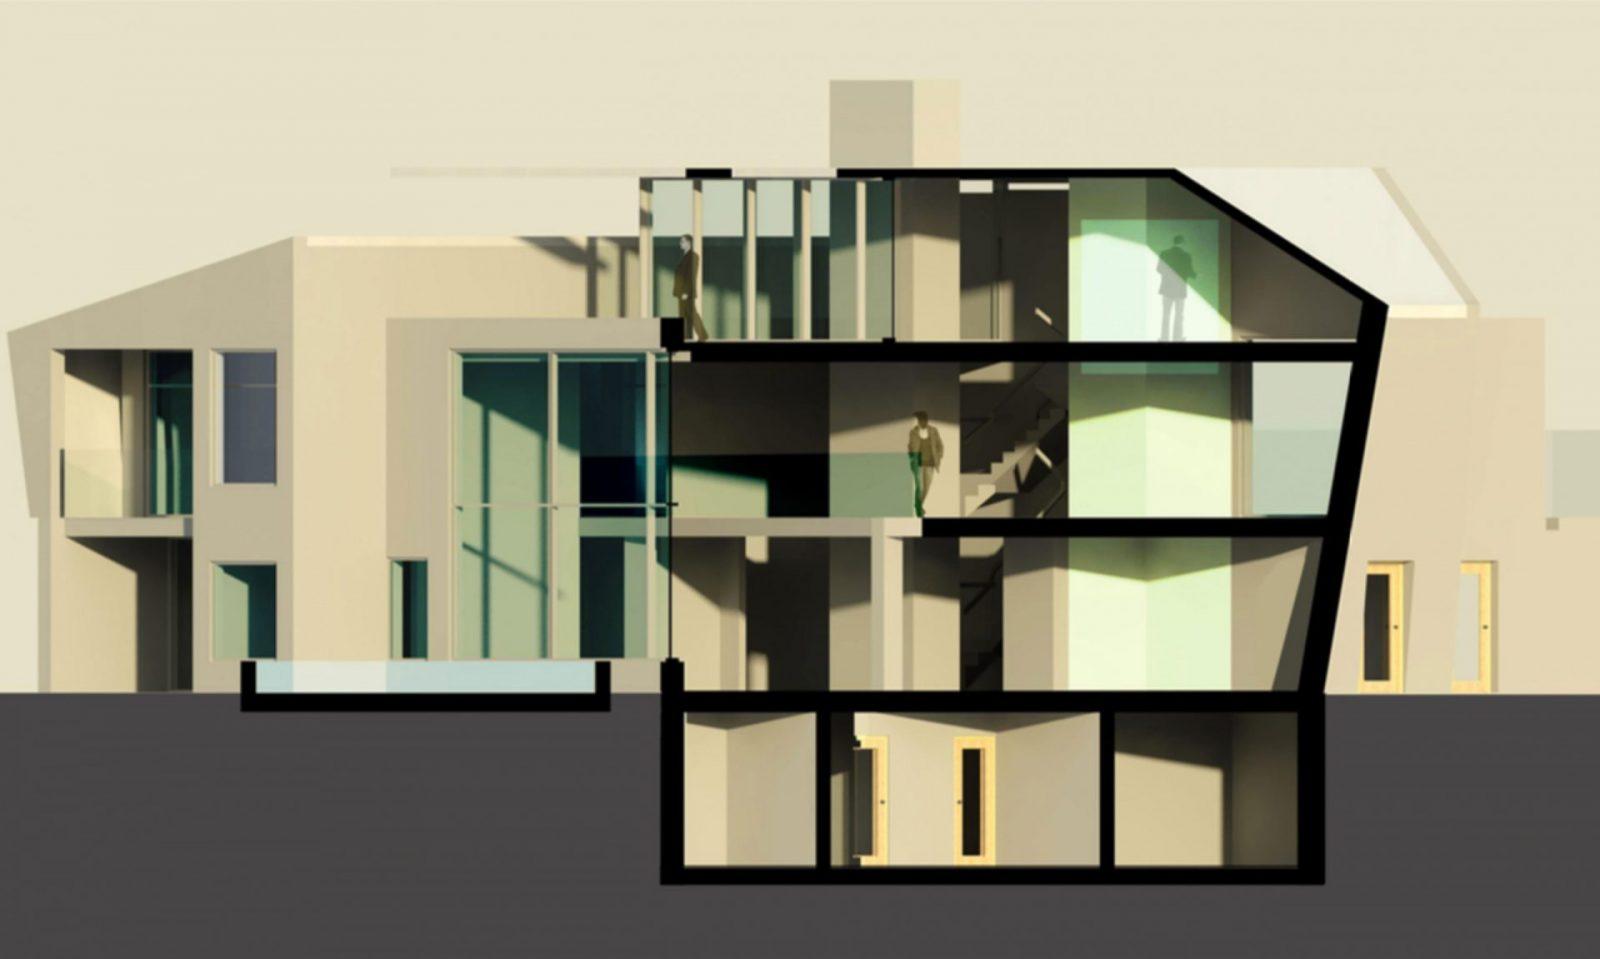 weathervane house modern architecture saundersfoot pembrokeshire architects jersey2